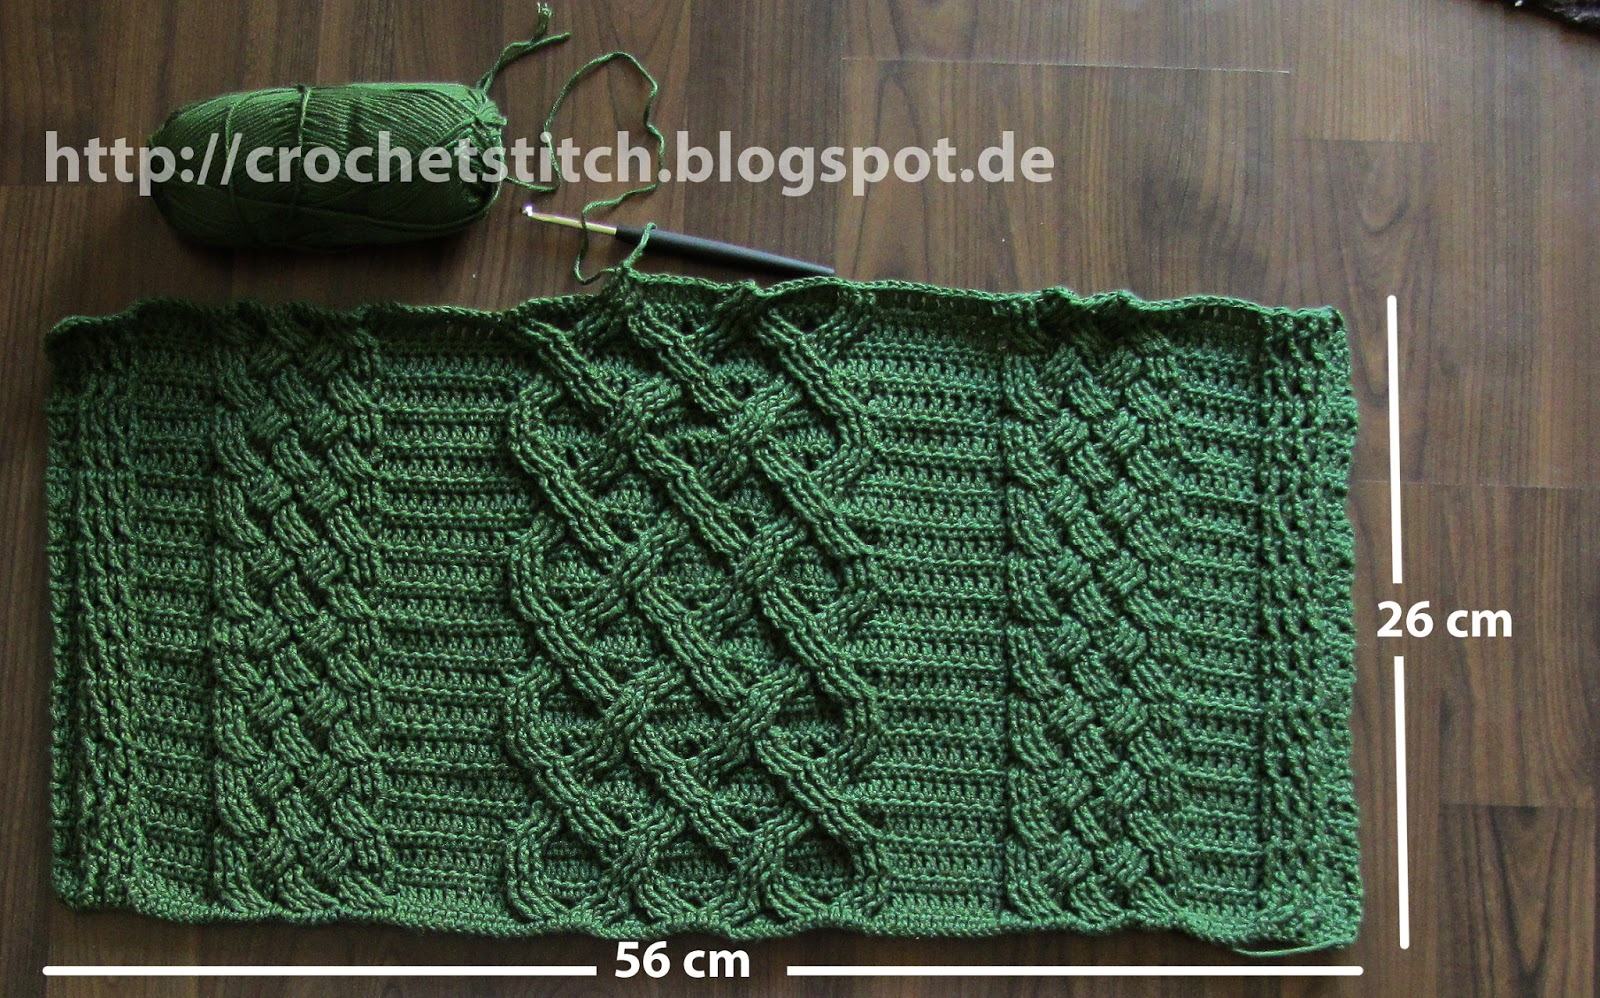 Crochet & Knitting Stitch: April 2013